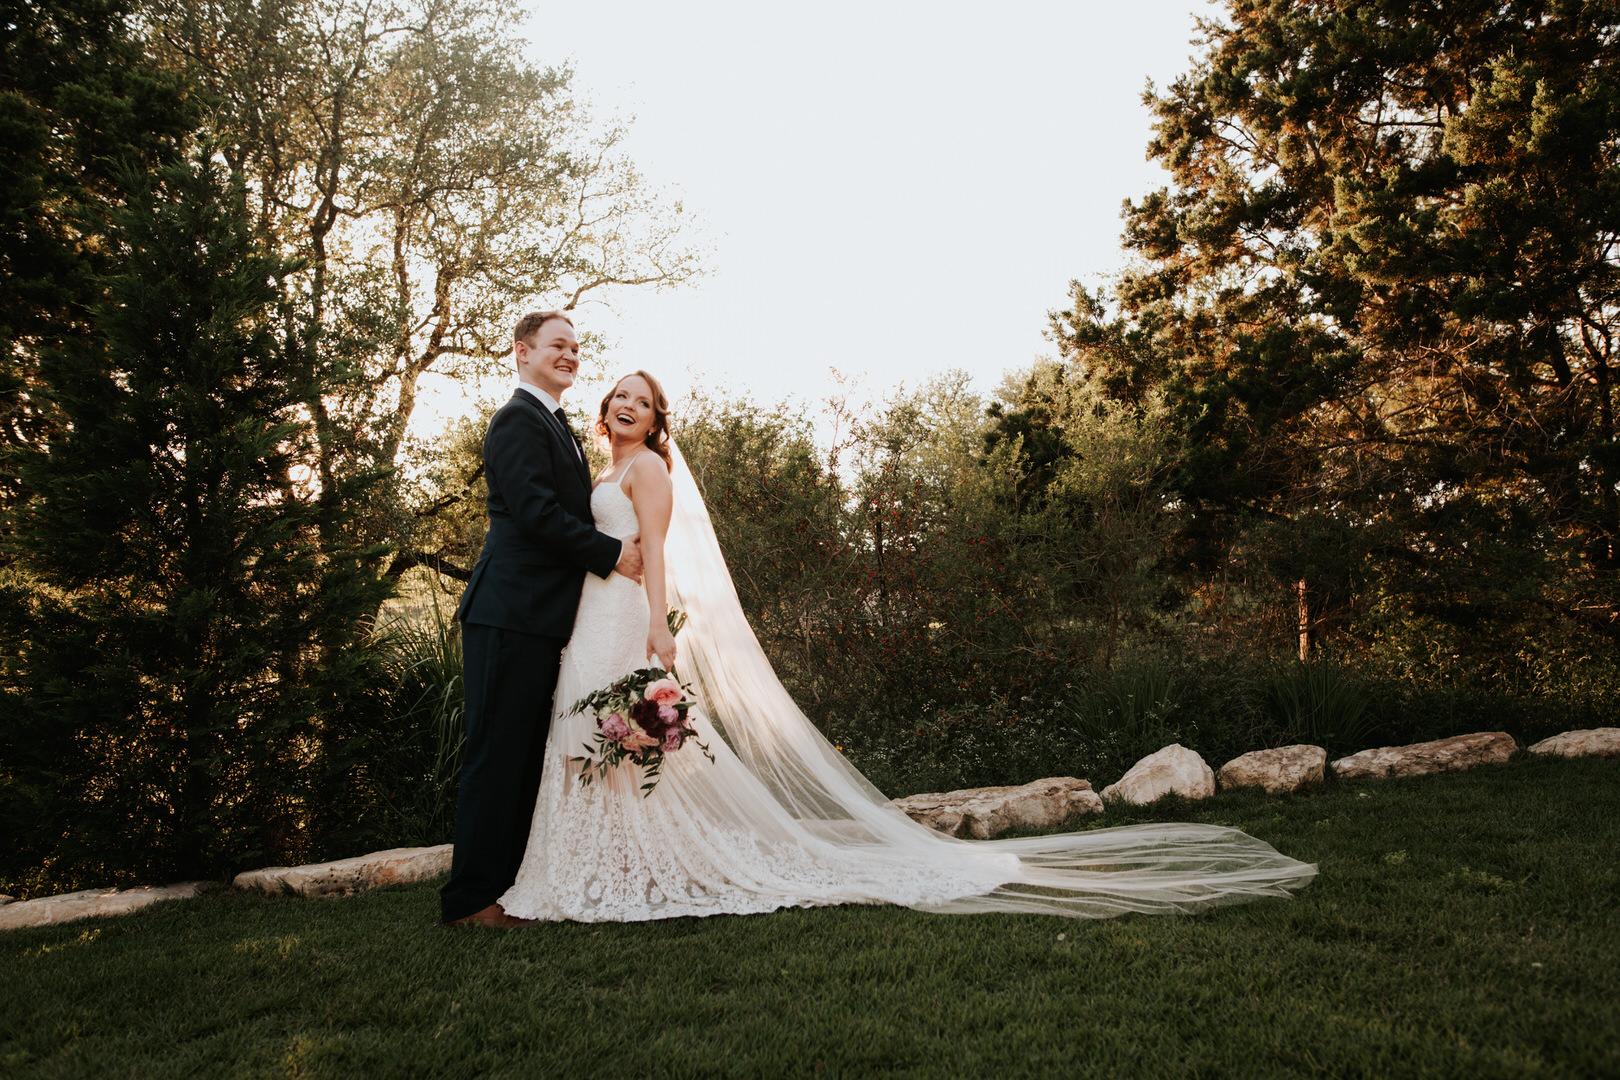 Lexi + Travis Wedding - Diana Ascarrunz Photography-543.jpg